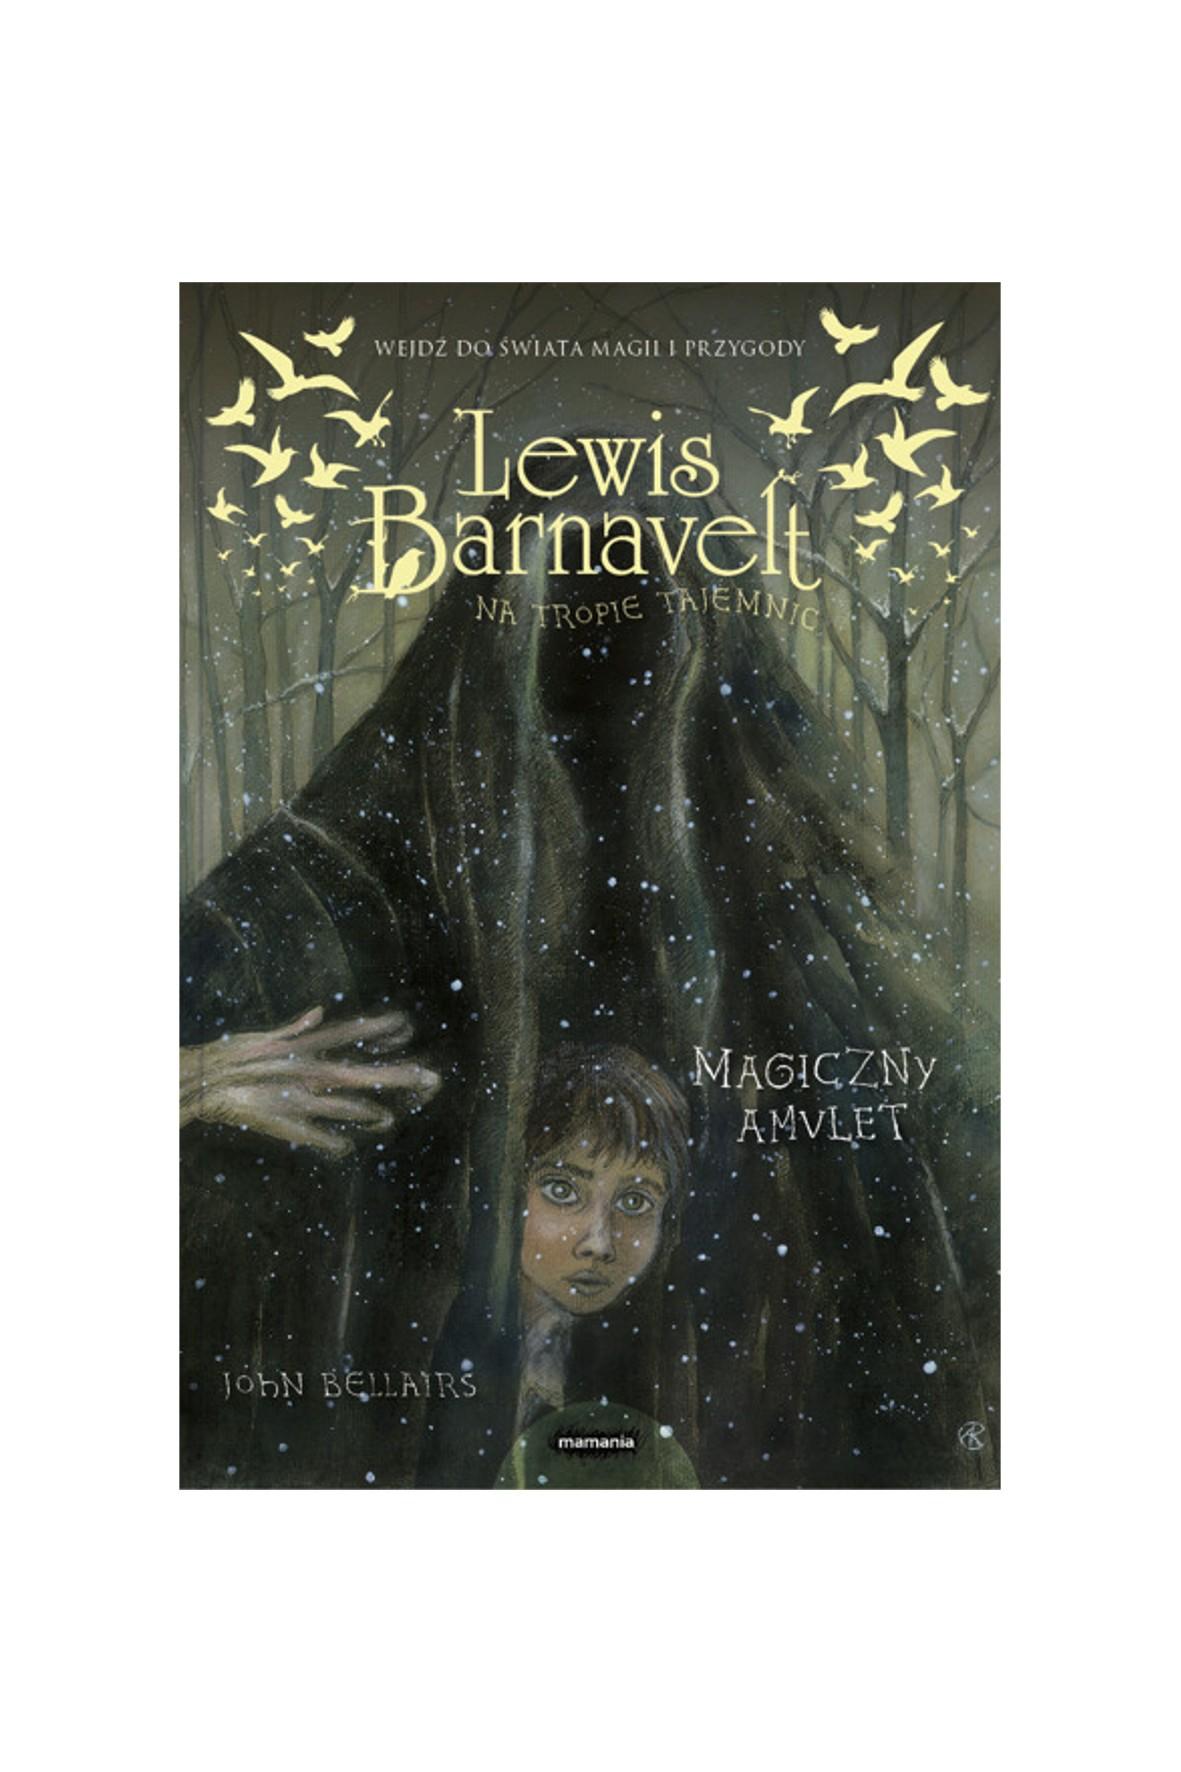 "Książka ""Lewis Barnavelt na tropie tajemnic. Magiczny amulet"" L.Barnavelt"